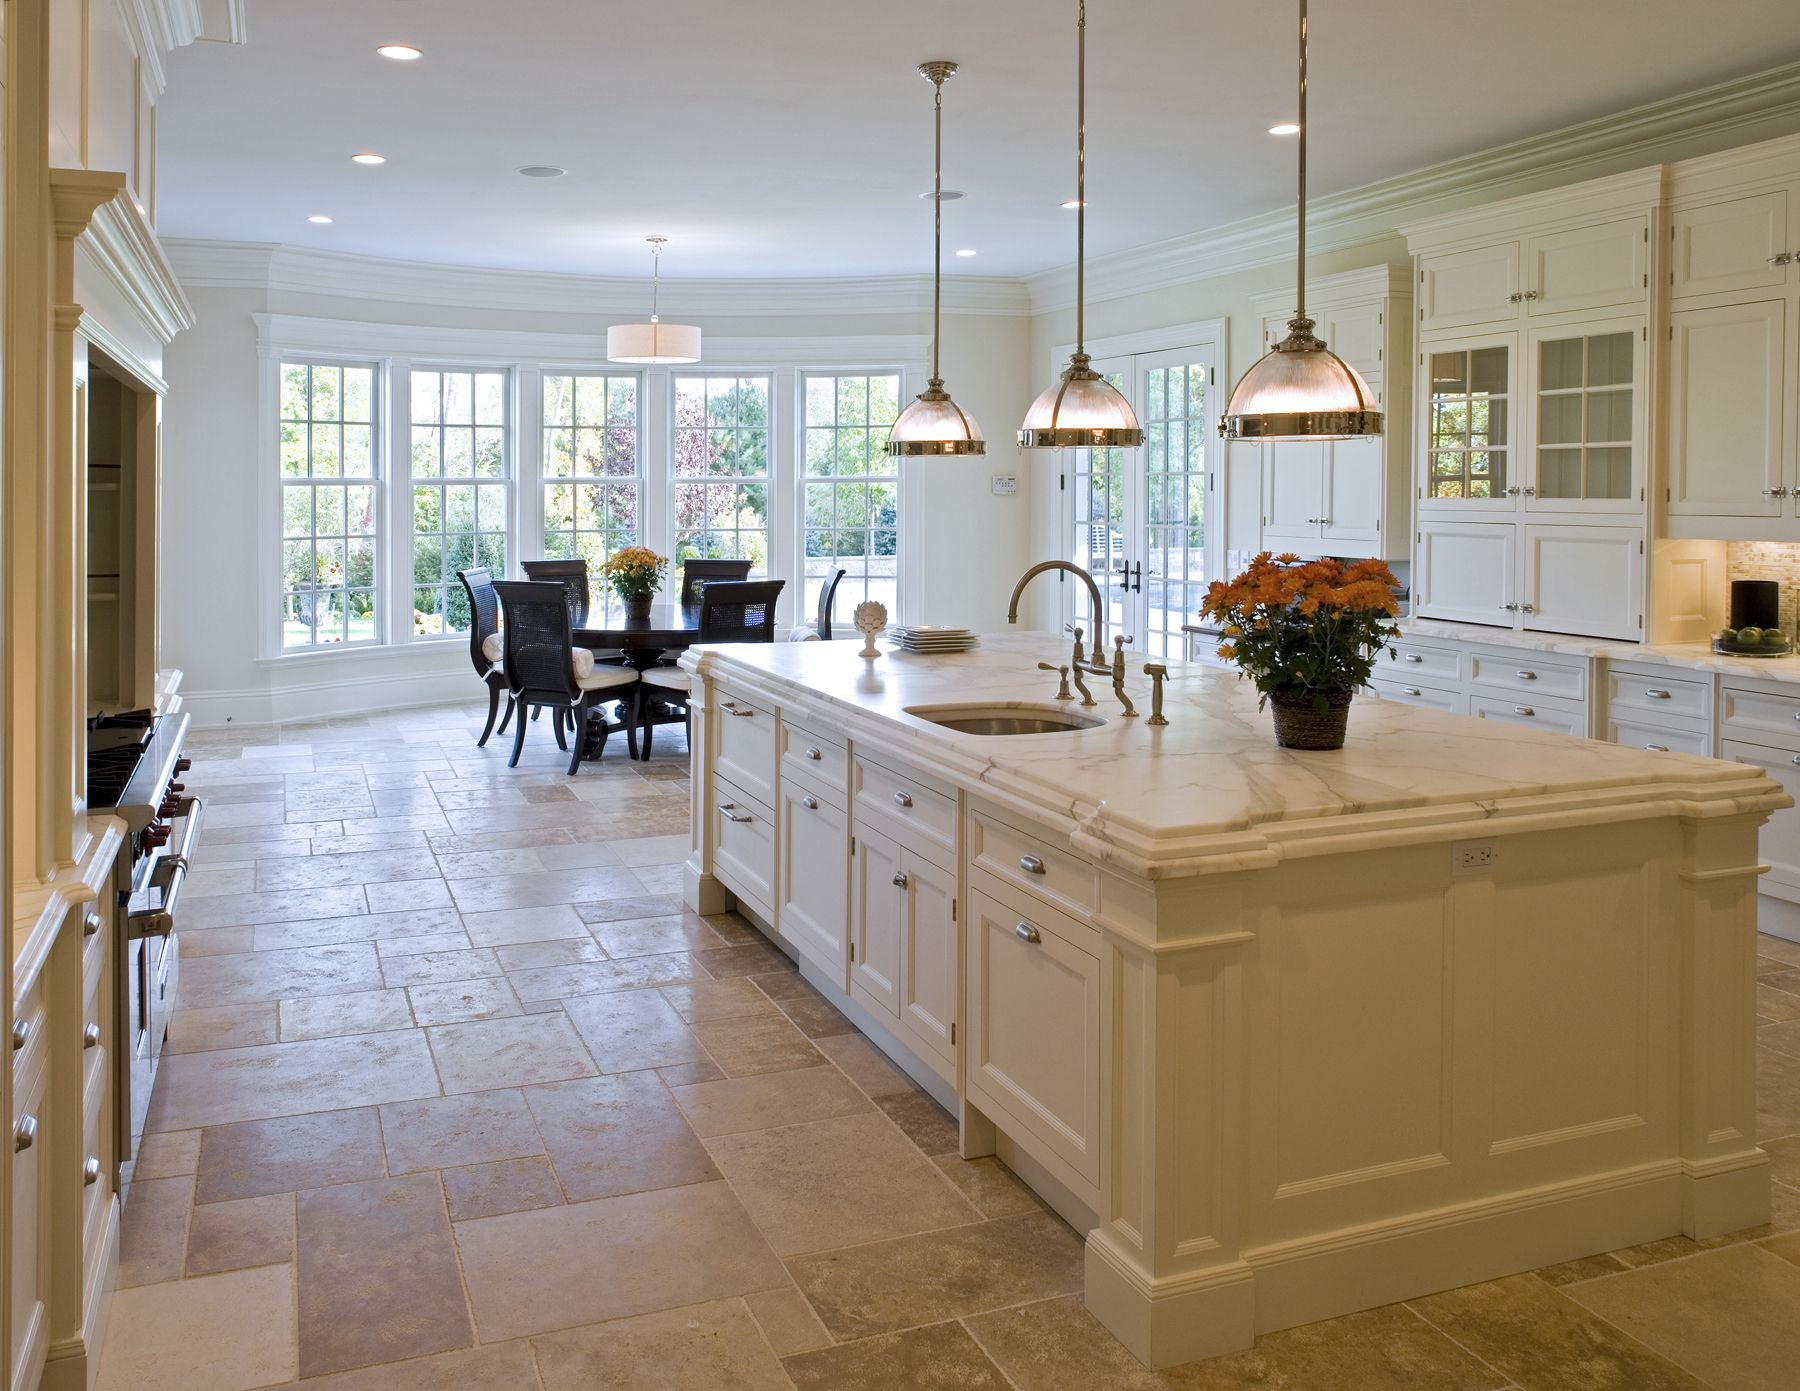 Best High End Small Kitchen Cabinets Remodelación De Cocina 400 x 300